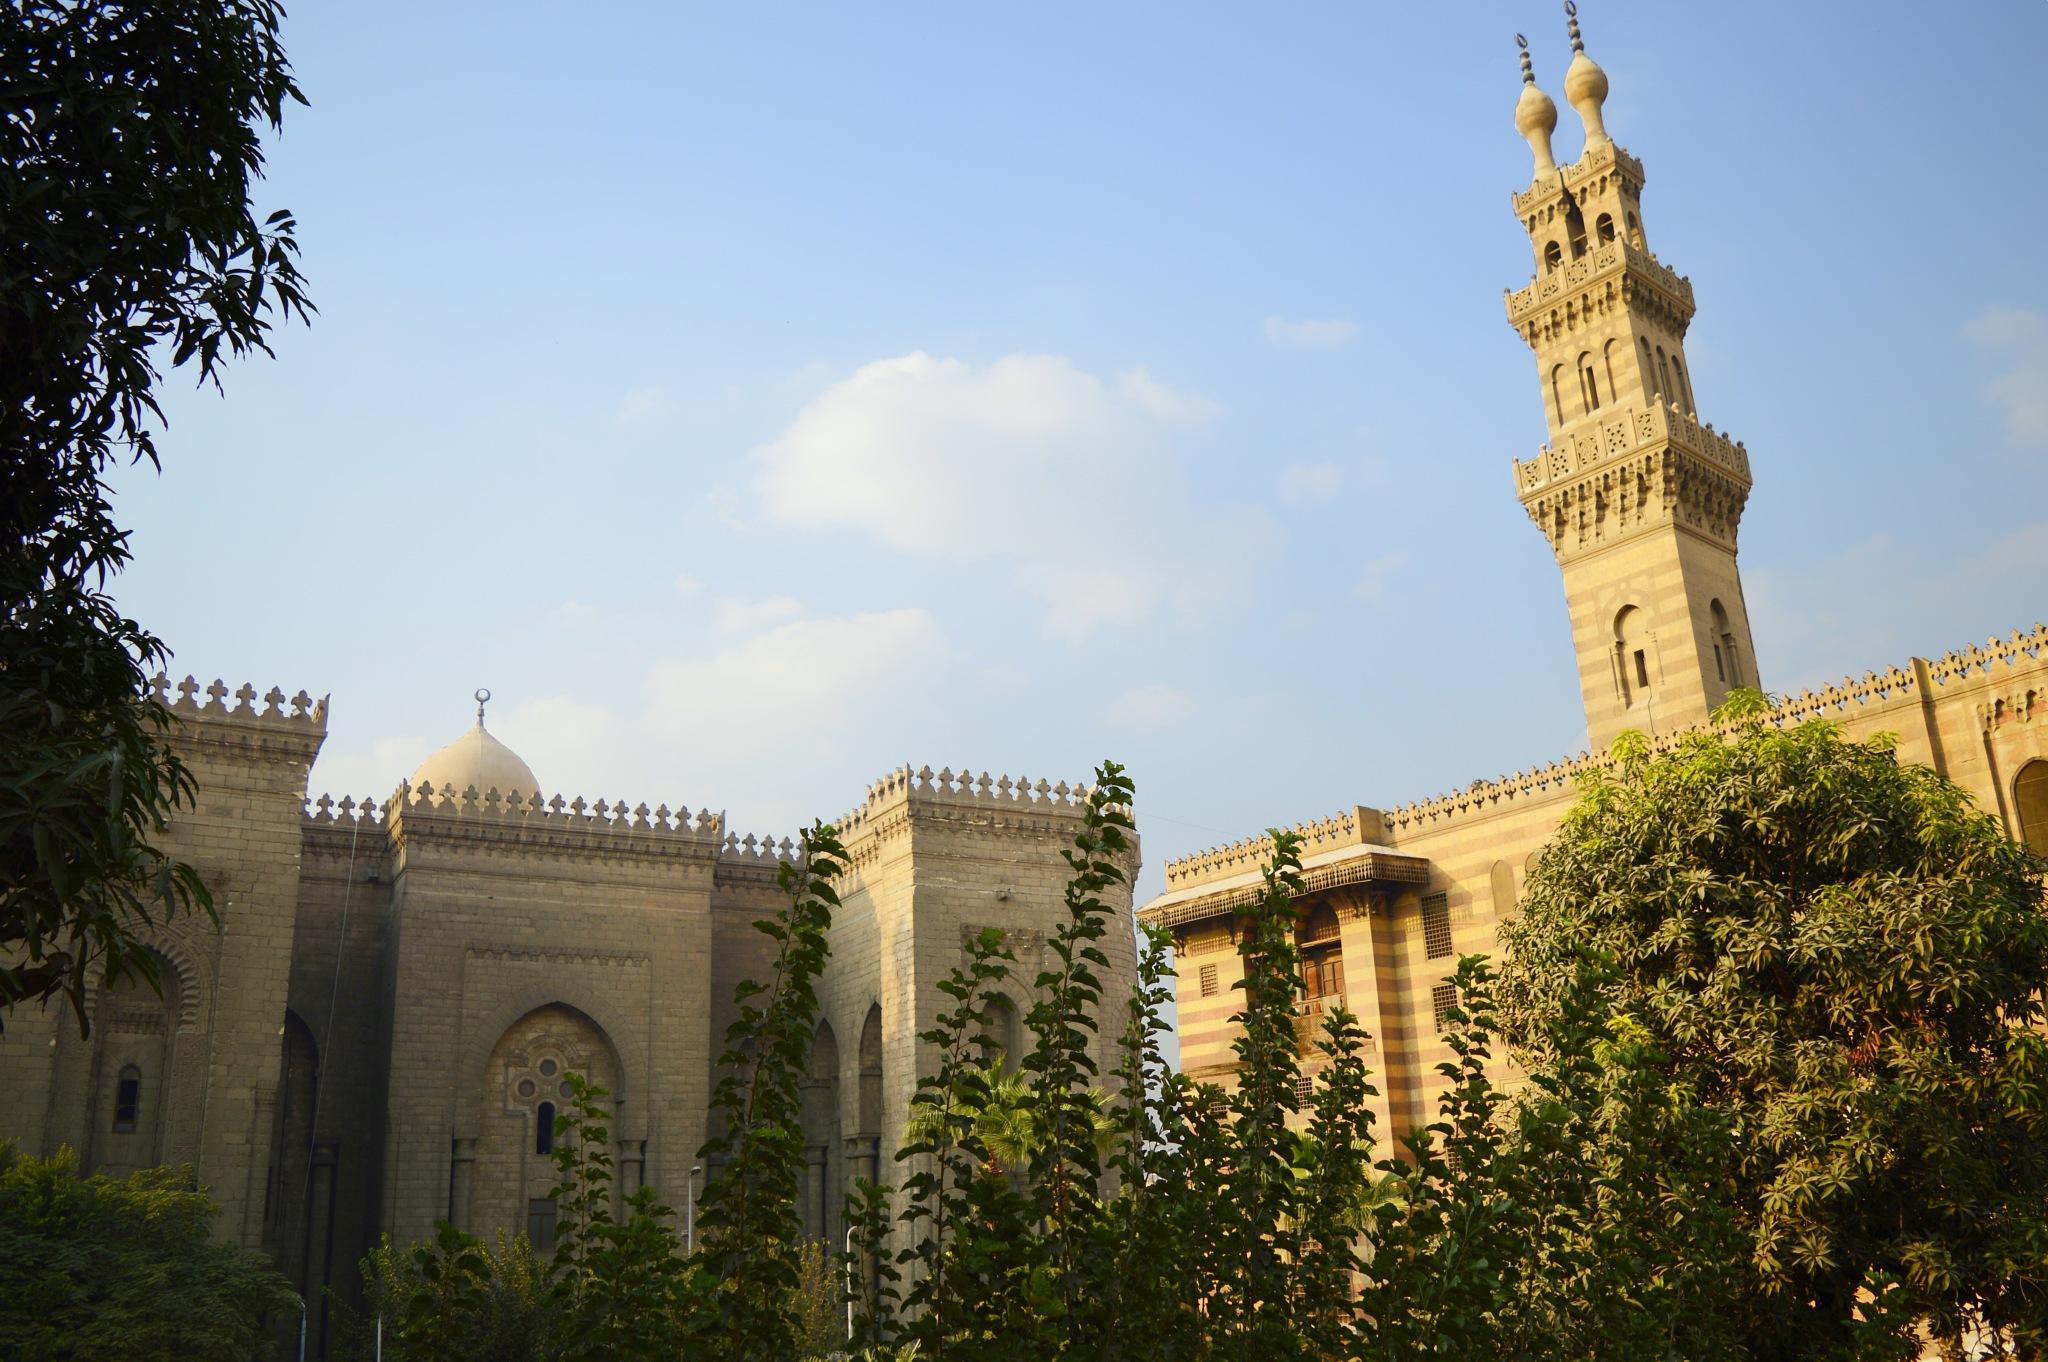 Sultan Hassan Mosque by OmAr M. Abd-Ulkader